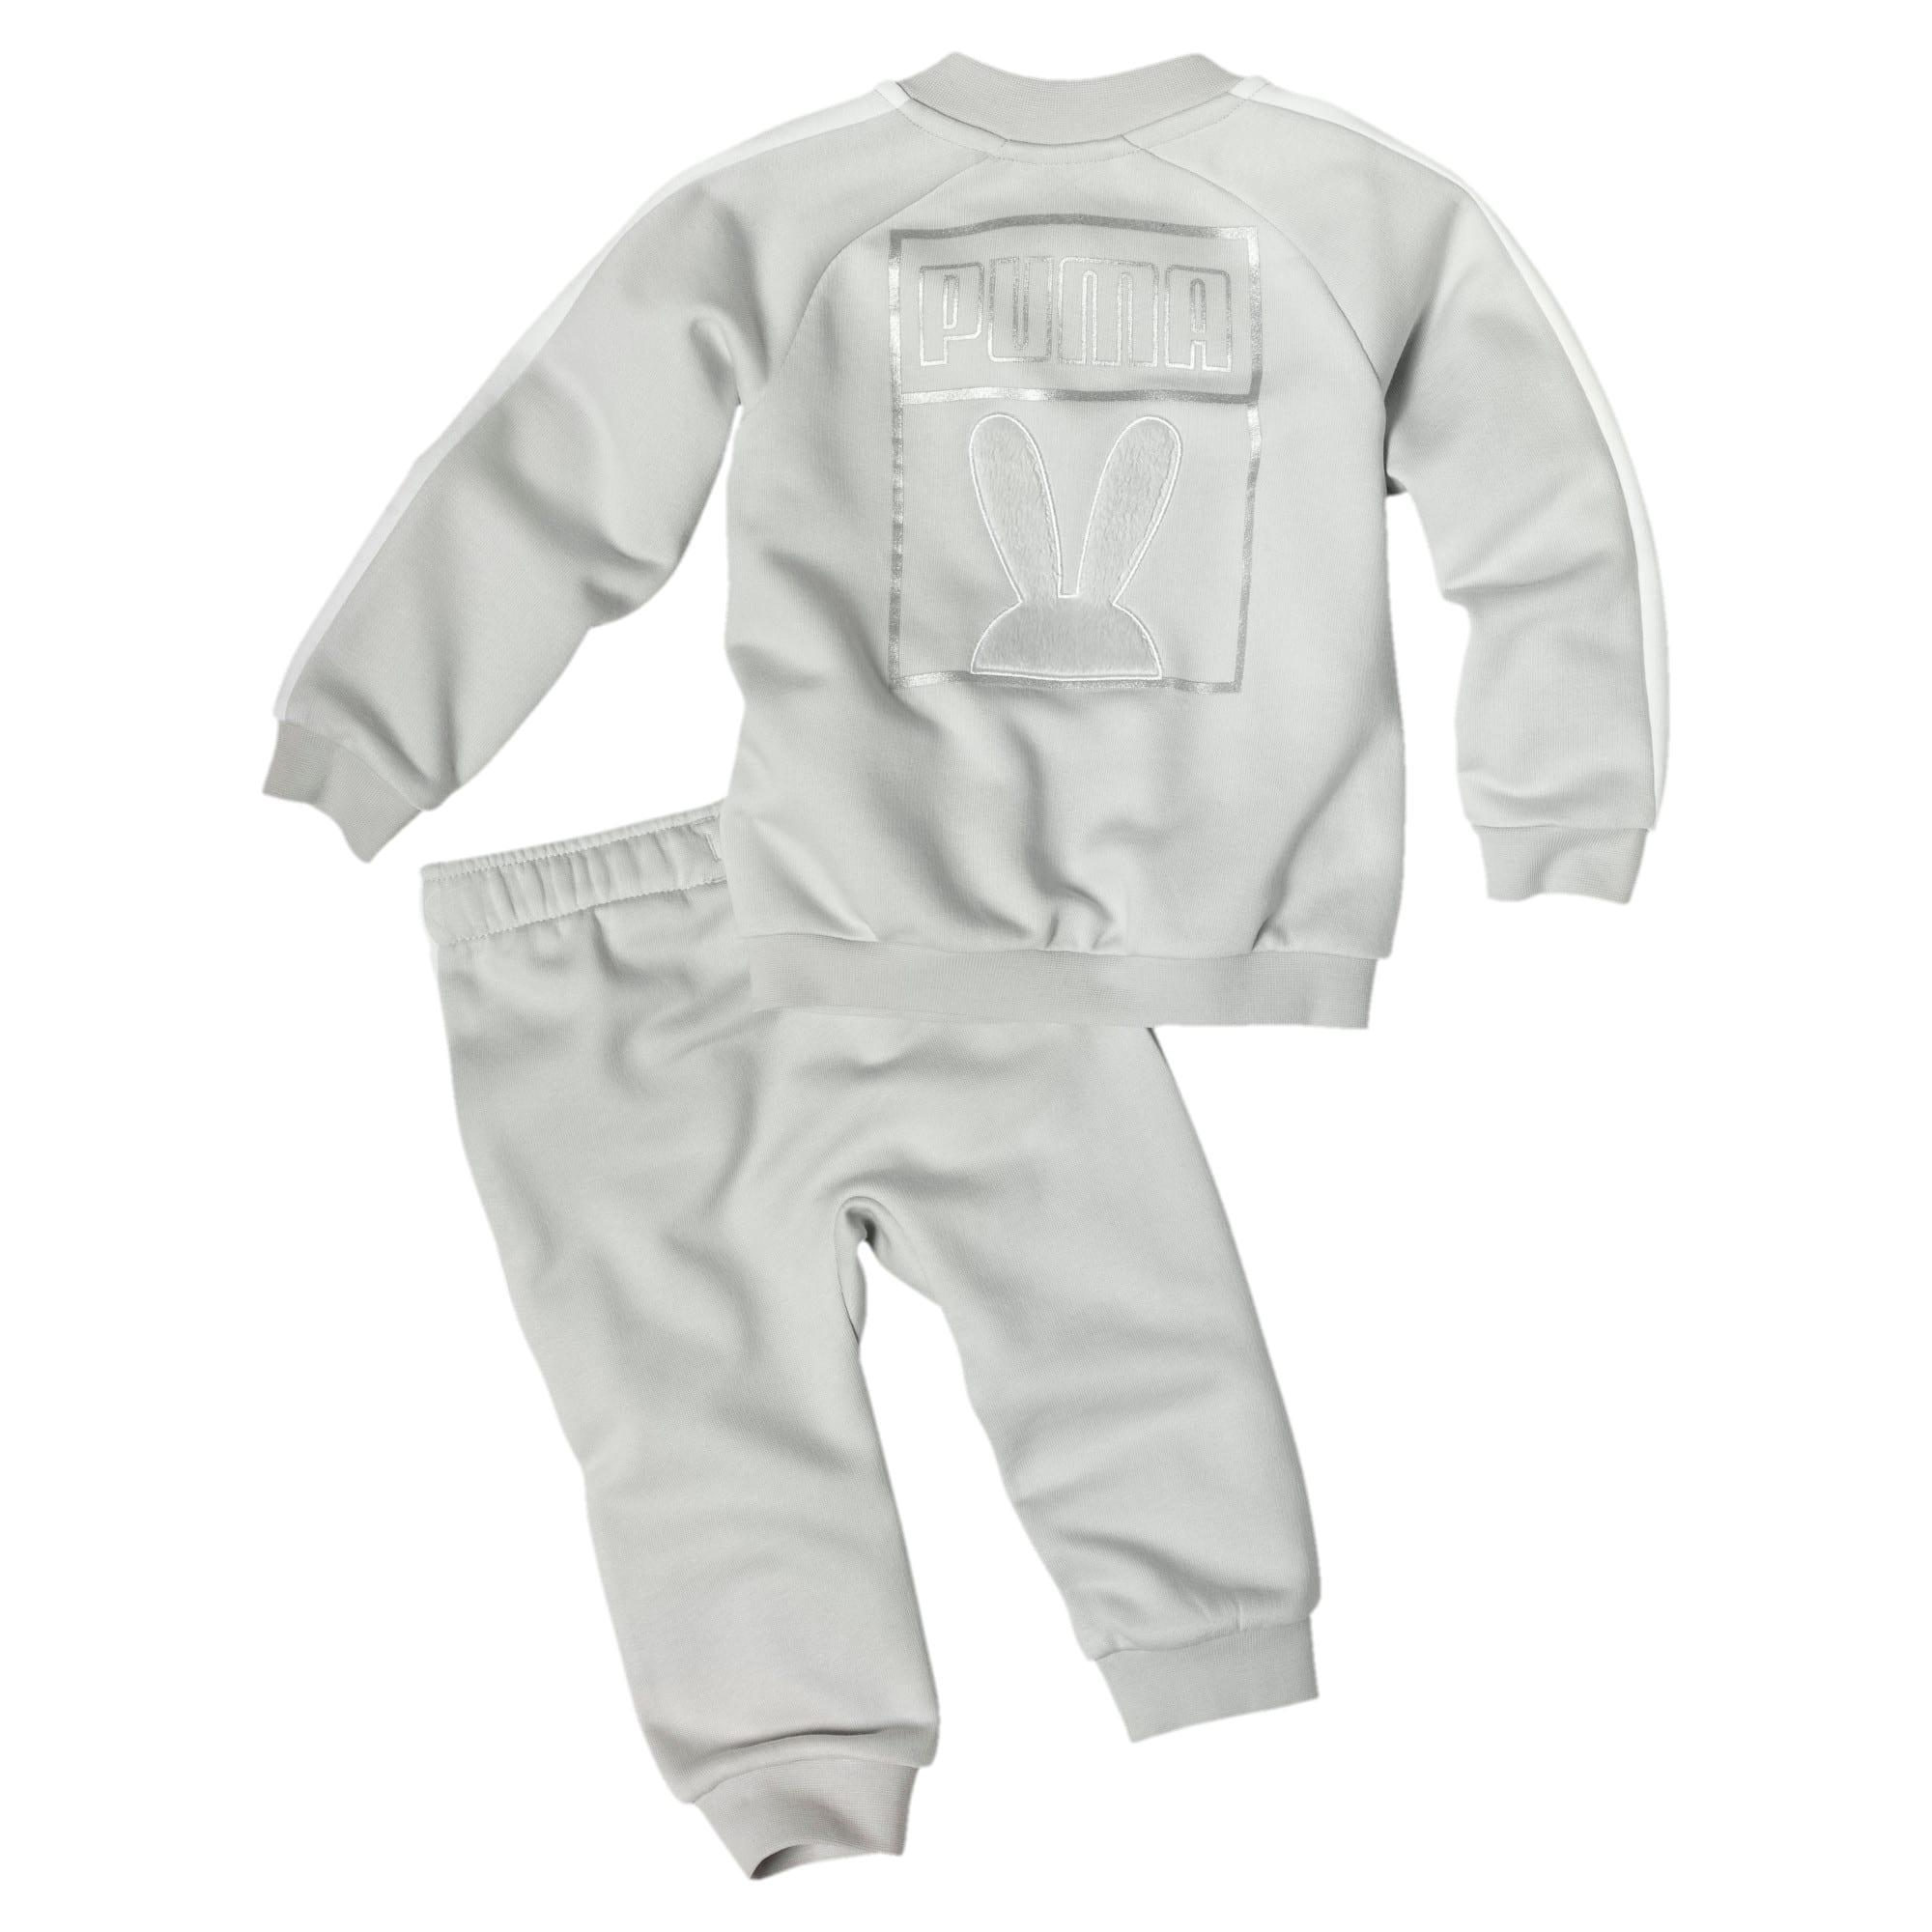 Thumbnail 2 of Infant + Toddler Easter Set, Glacier Gray, medium